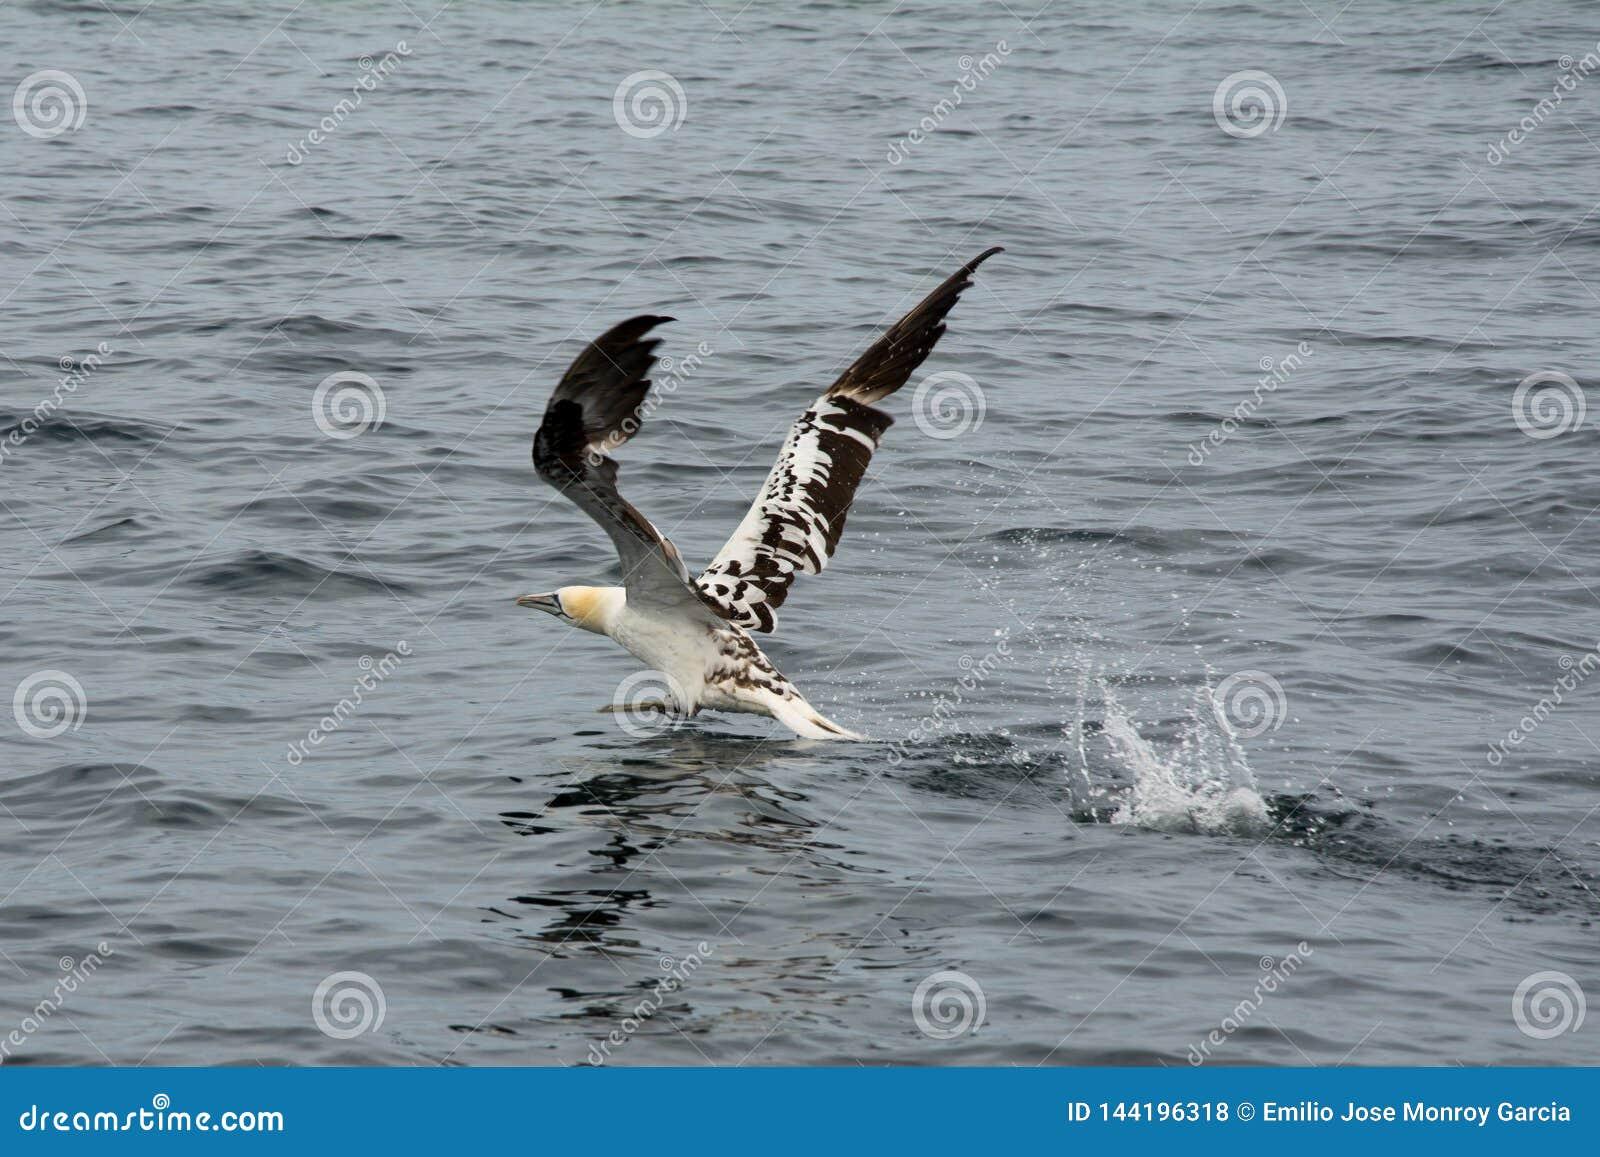 Northern gannet Morus bassanus flying over the sea